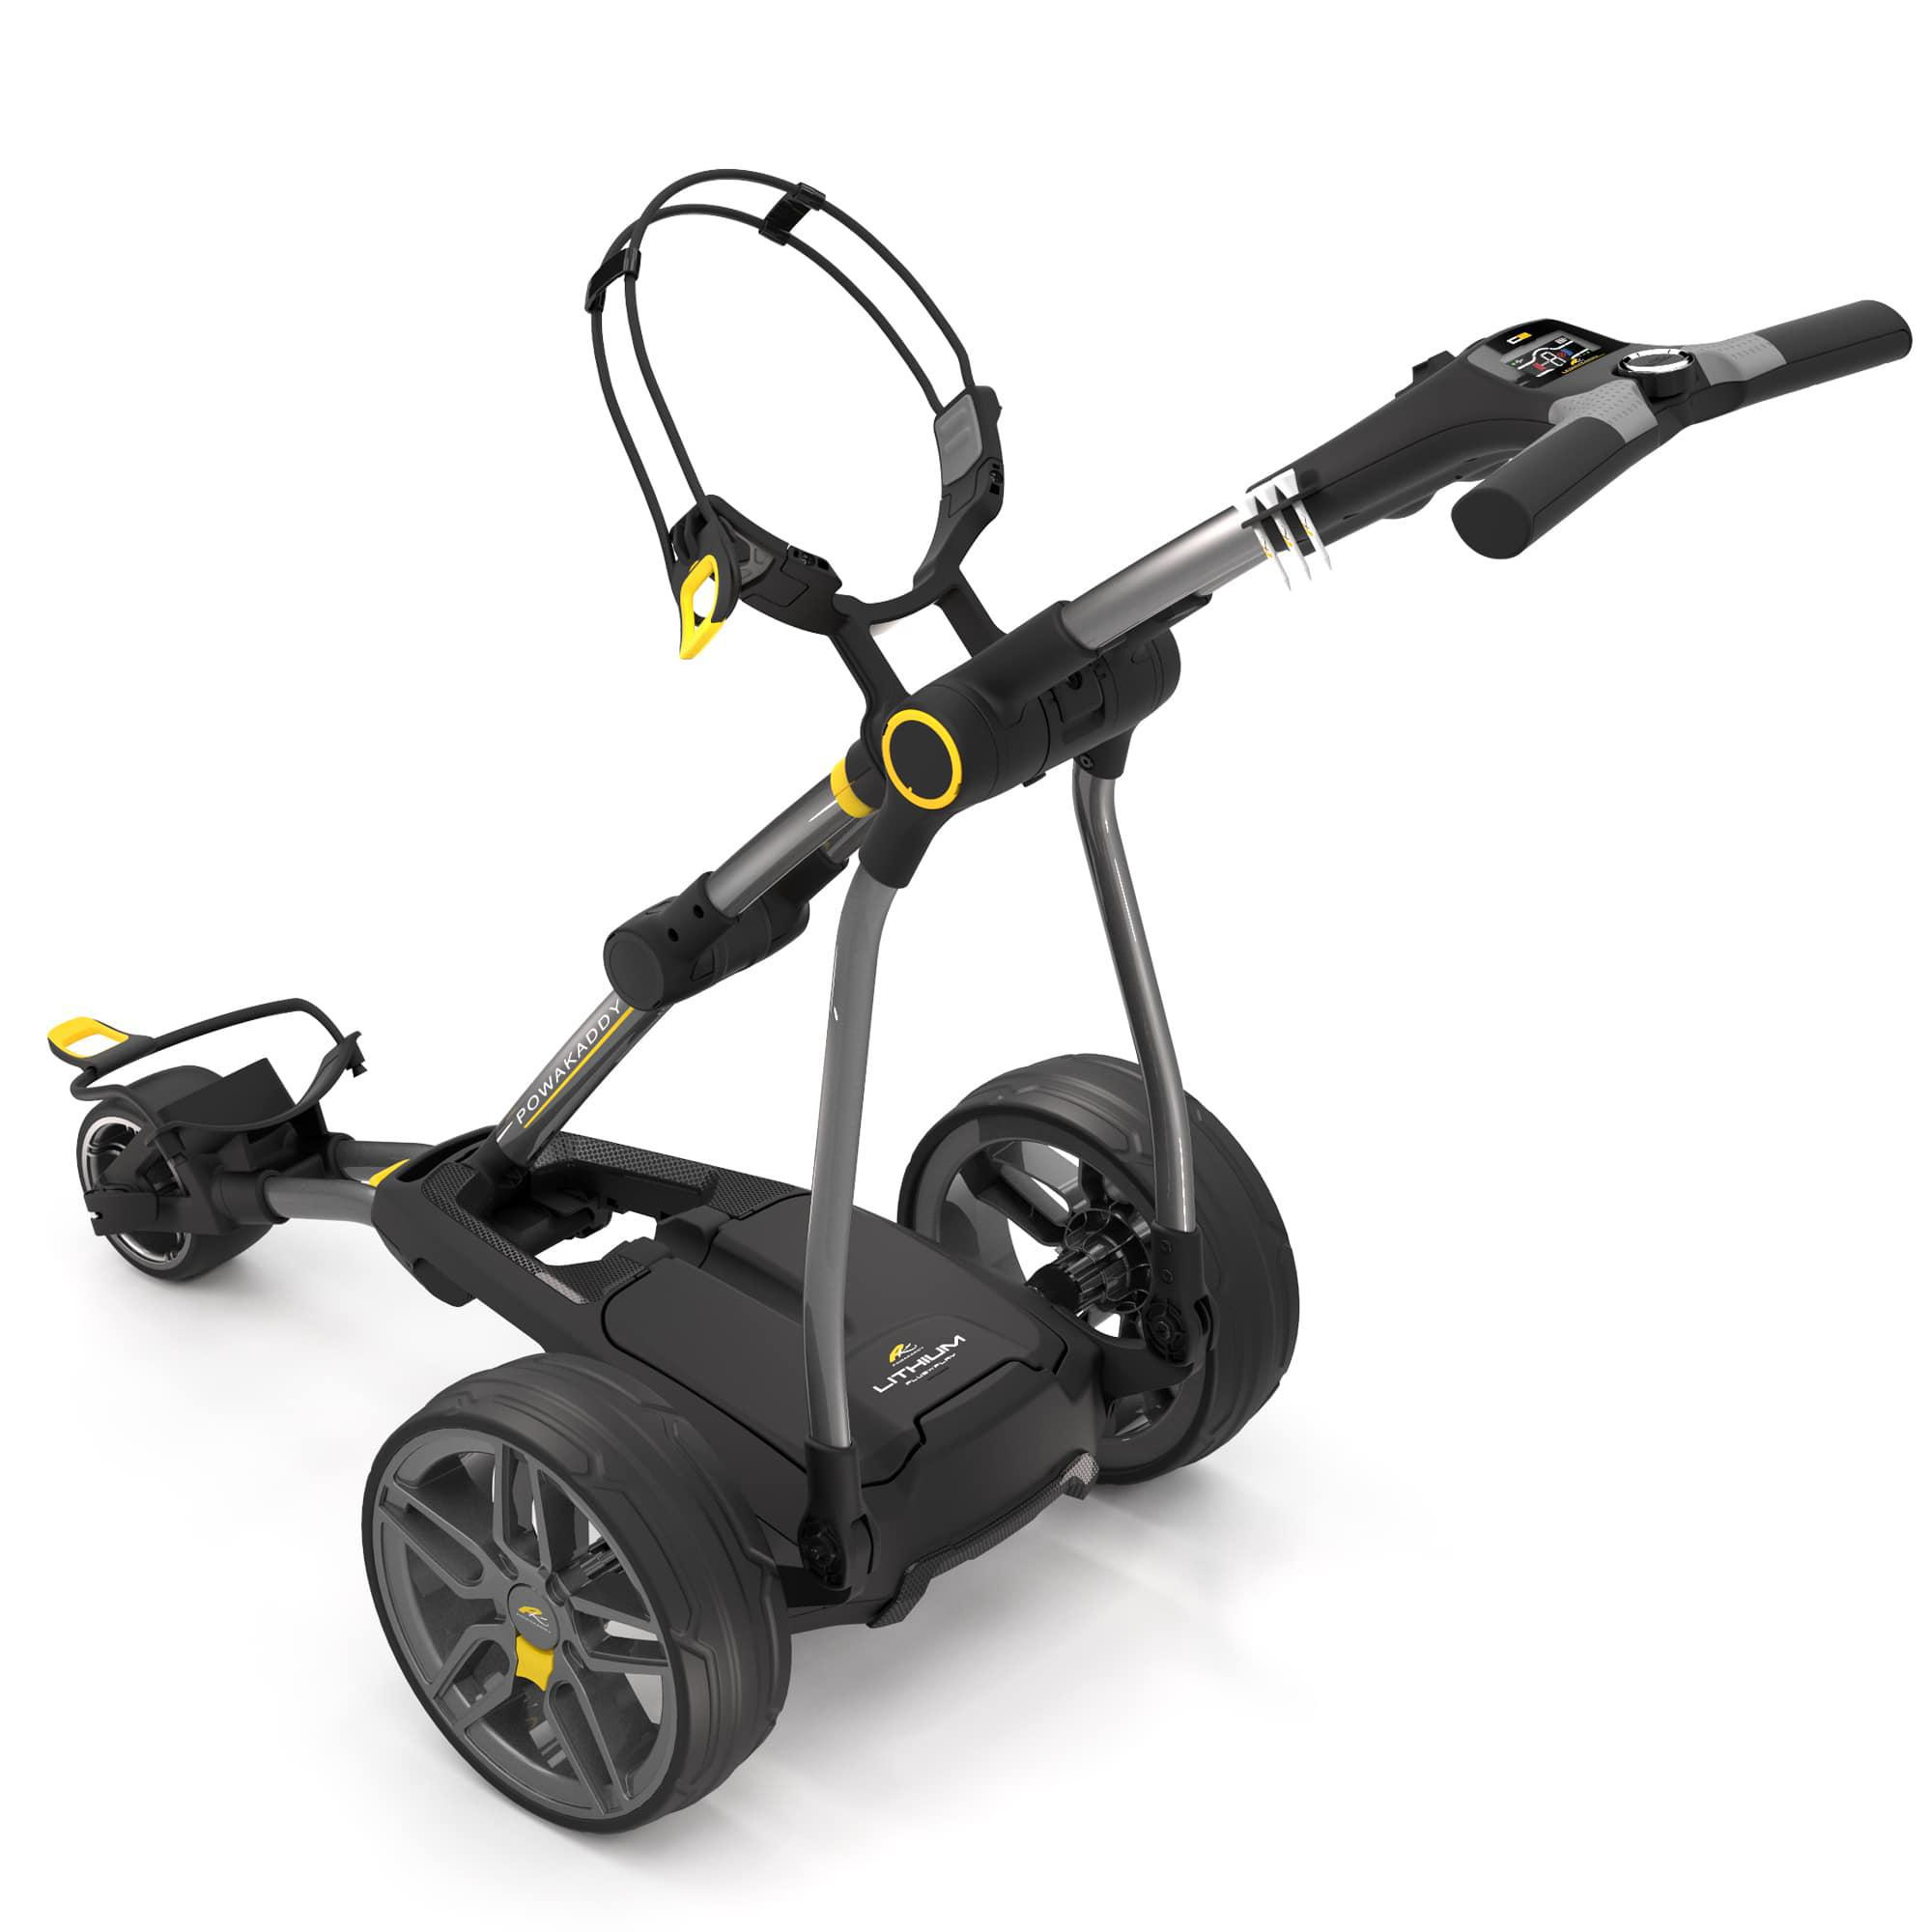 Powakaddy Electric Golf Trolley  Winner All The Way